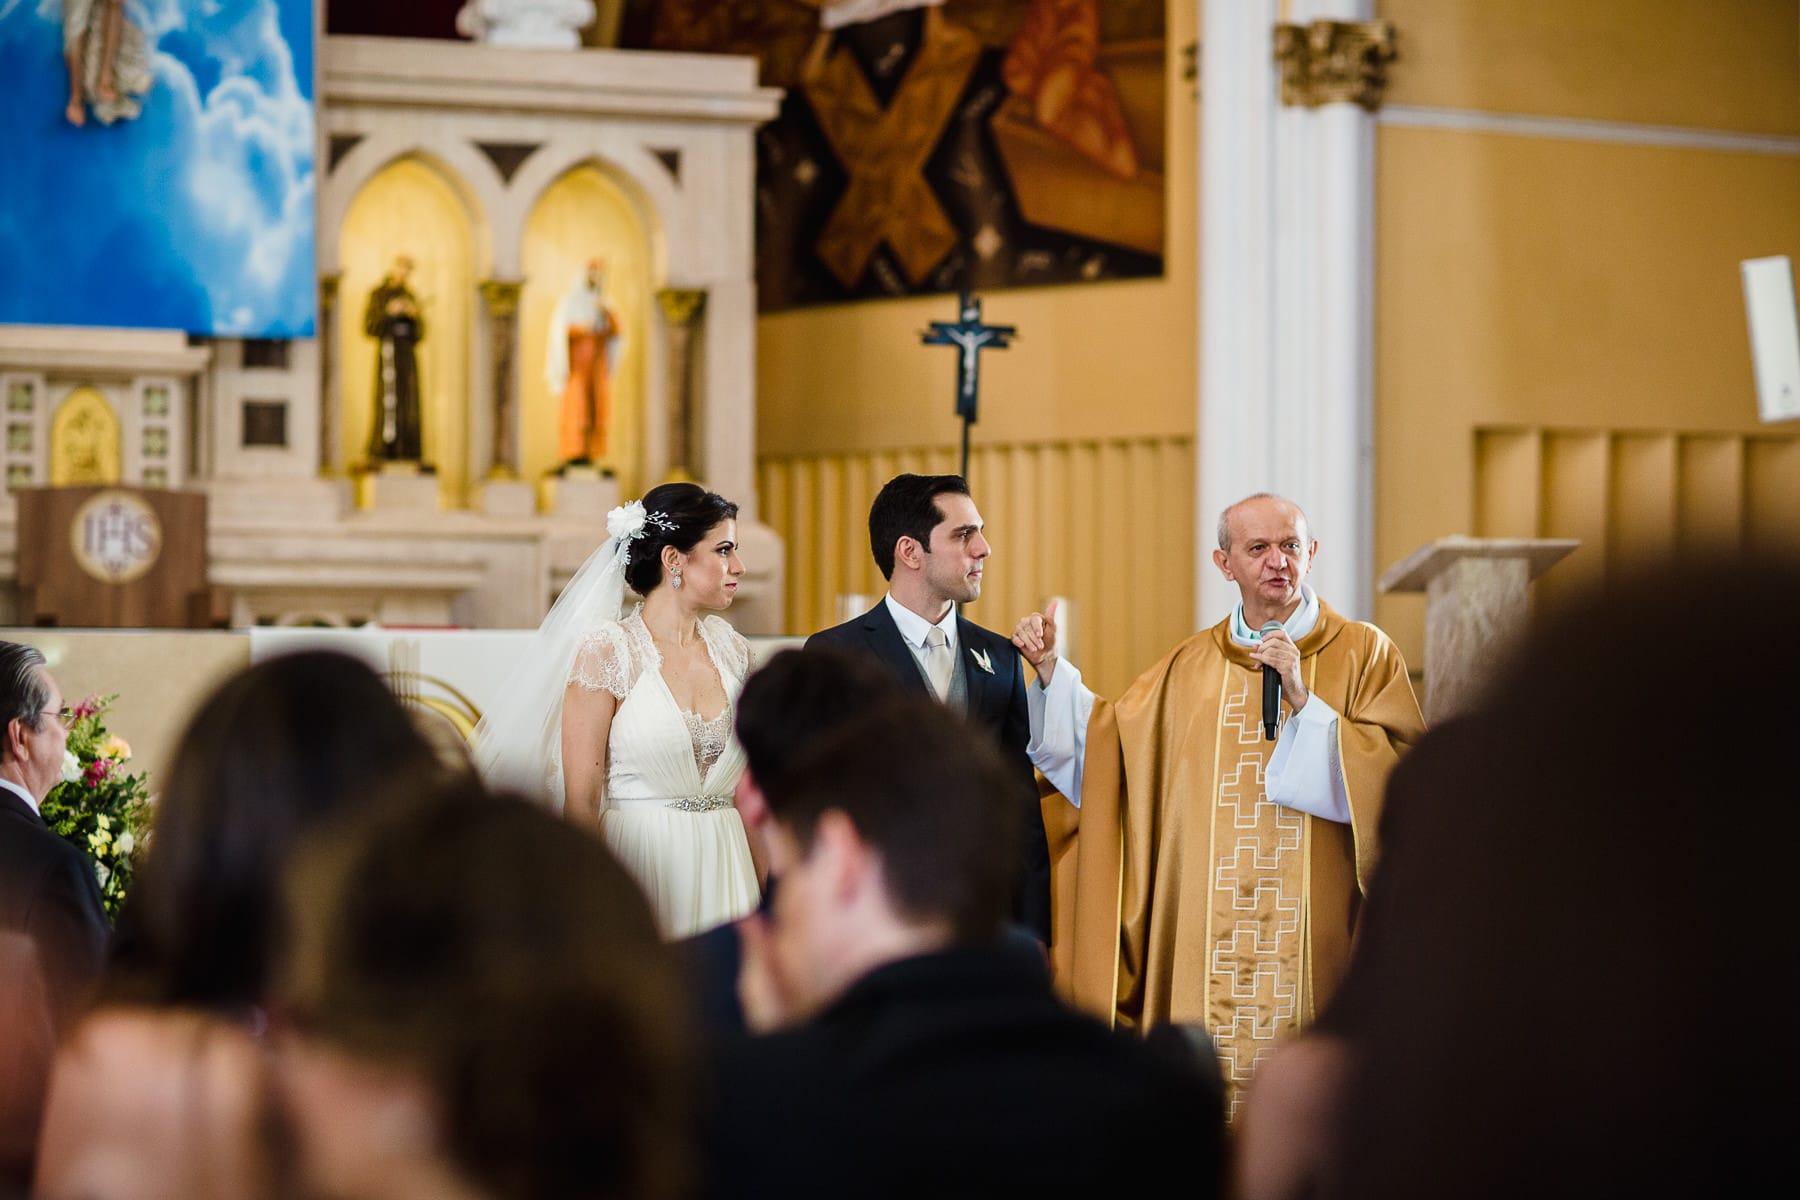 casamento-igreja-do-cristo-rei-fortaleza-38